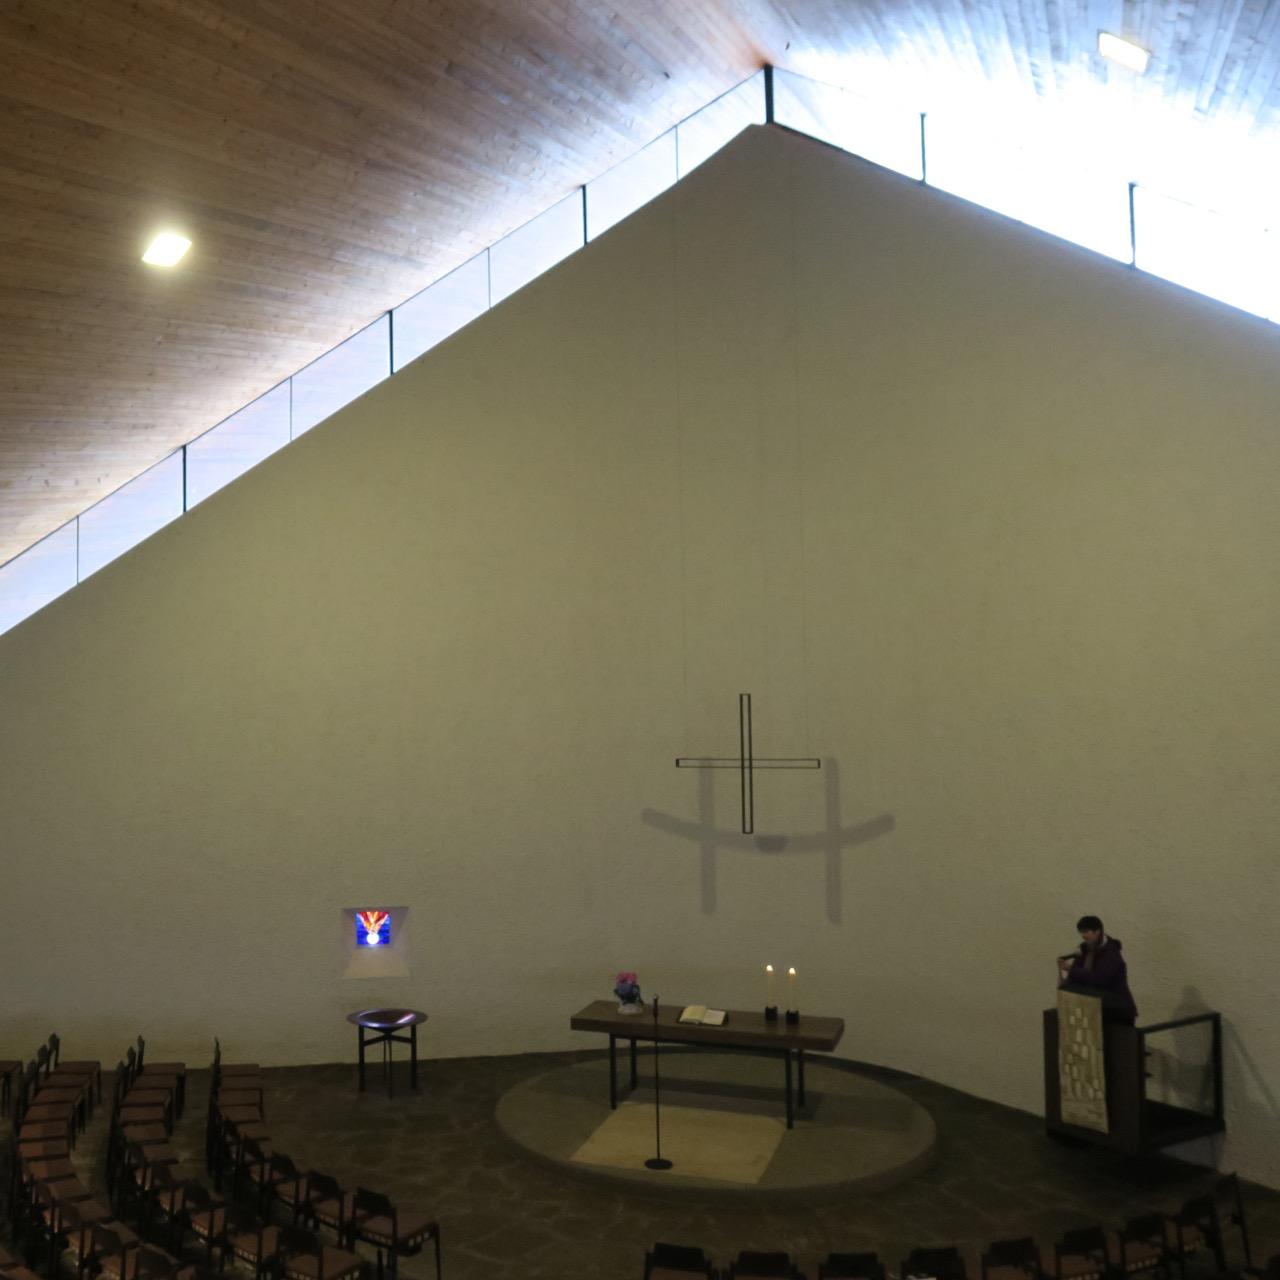 Christuskirche Esslingen-Zollberg, Innenansicht